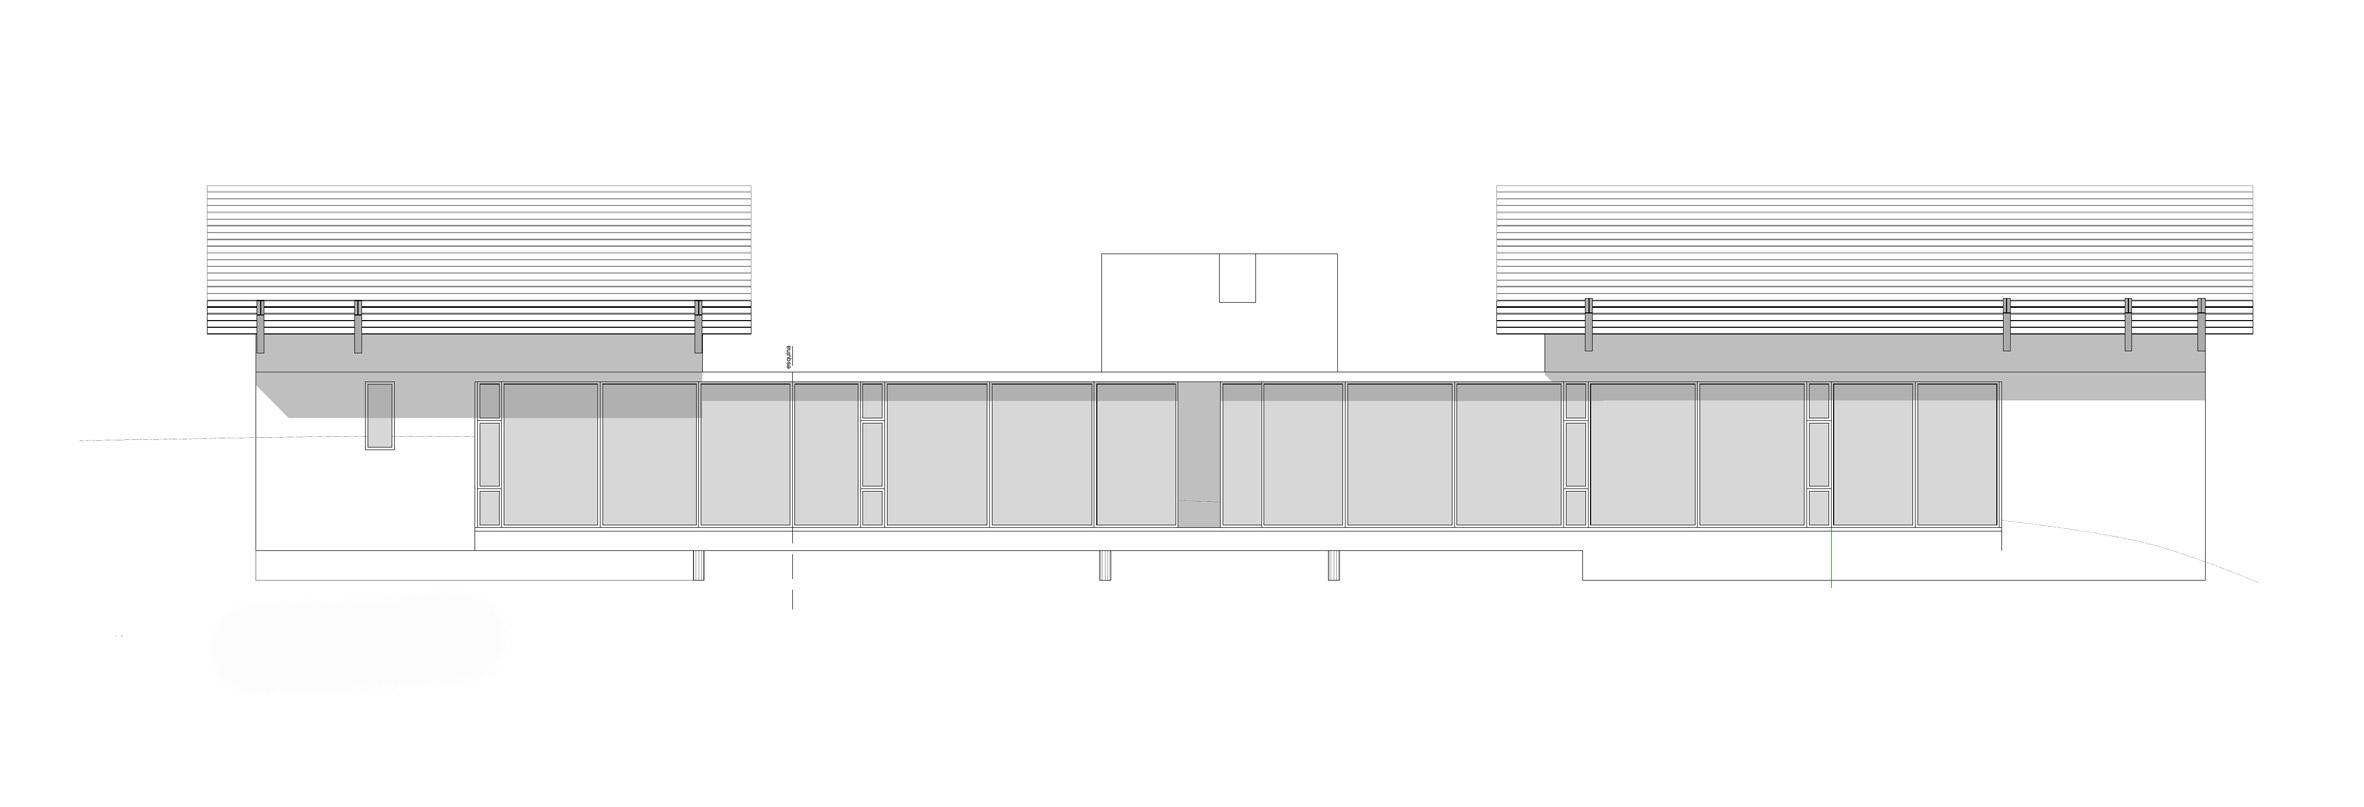 front-elevation-plan.jpg